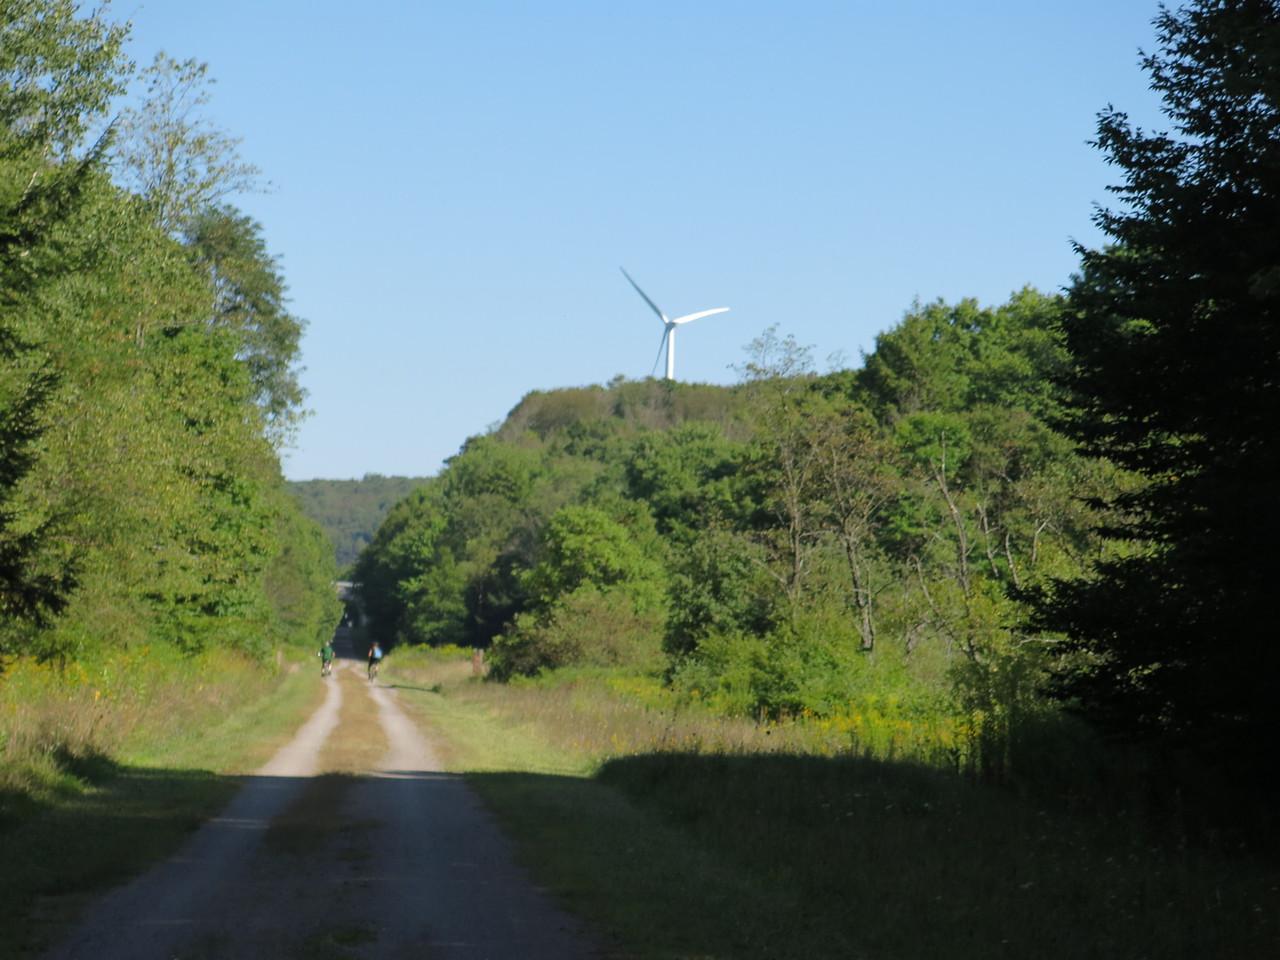 Land of wind mills